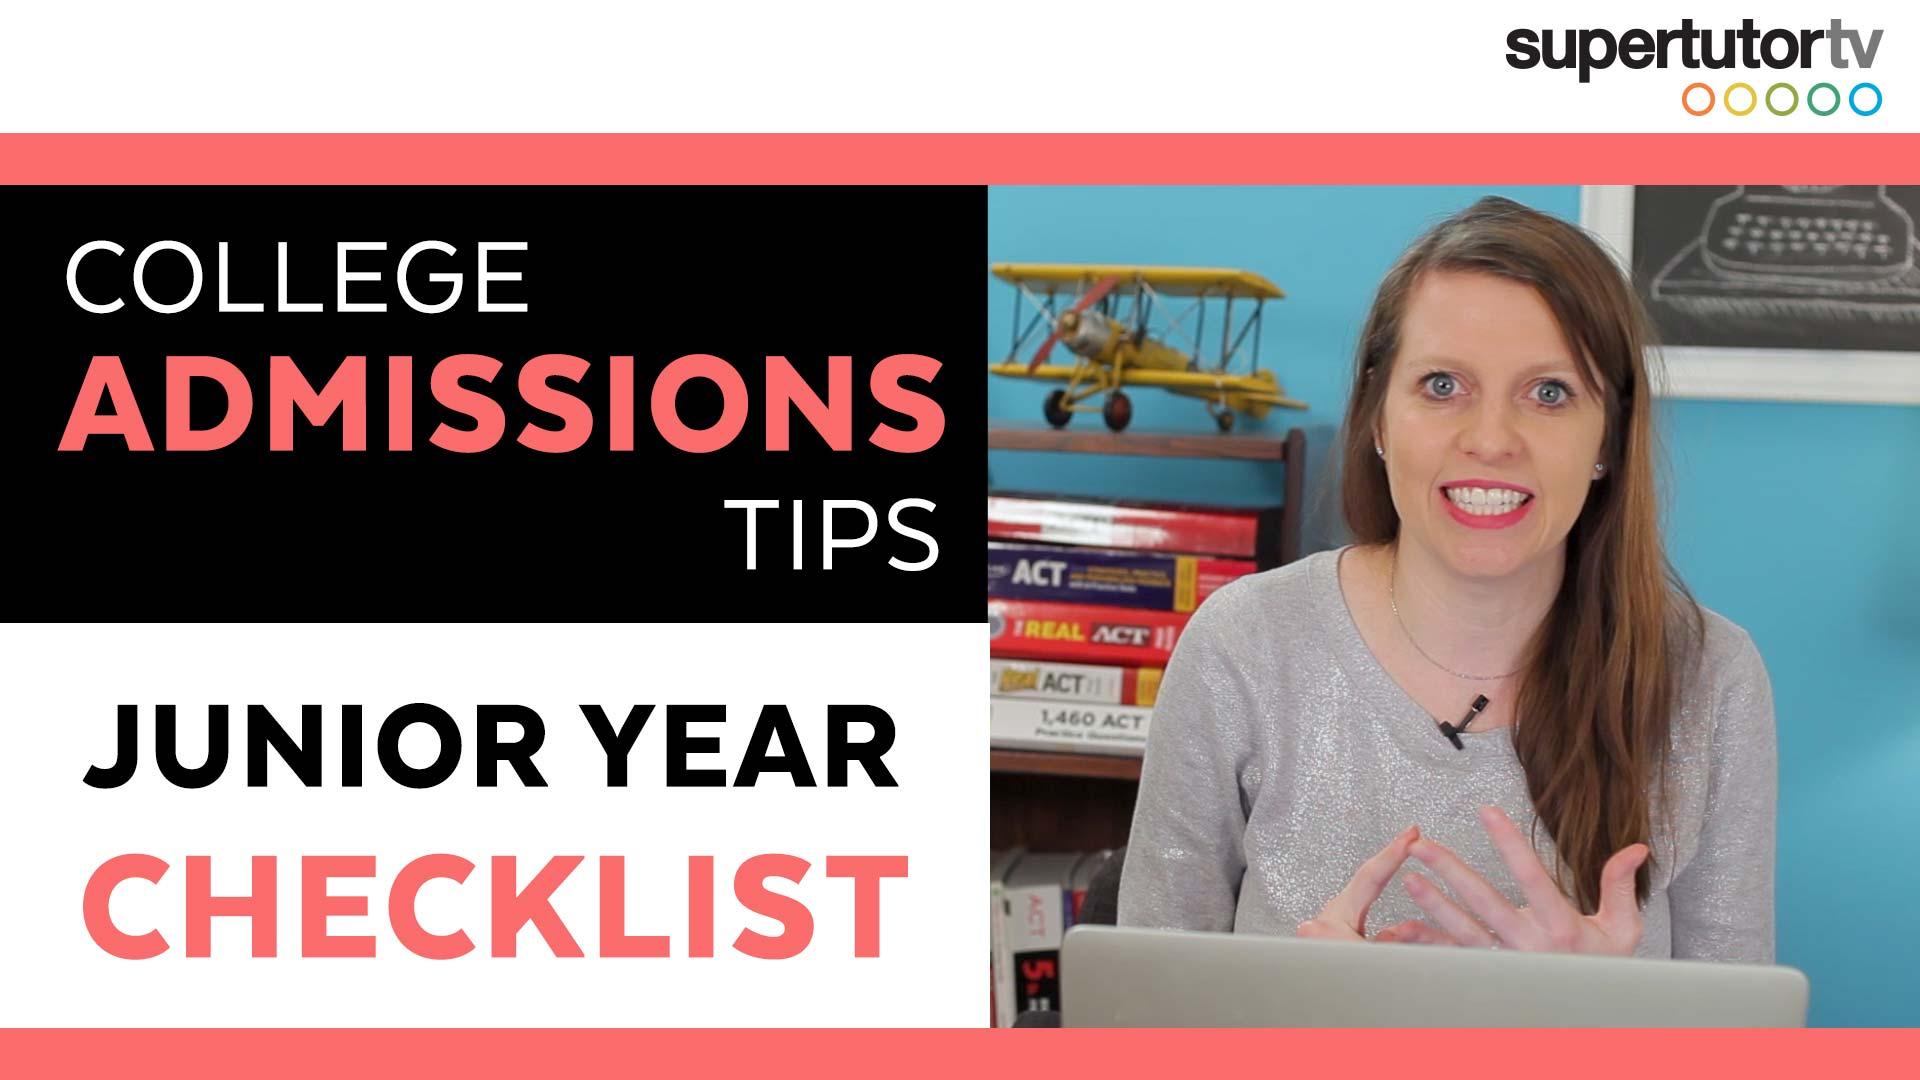 Junior Year Checklist: College Admissions Tips